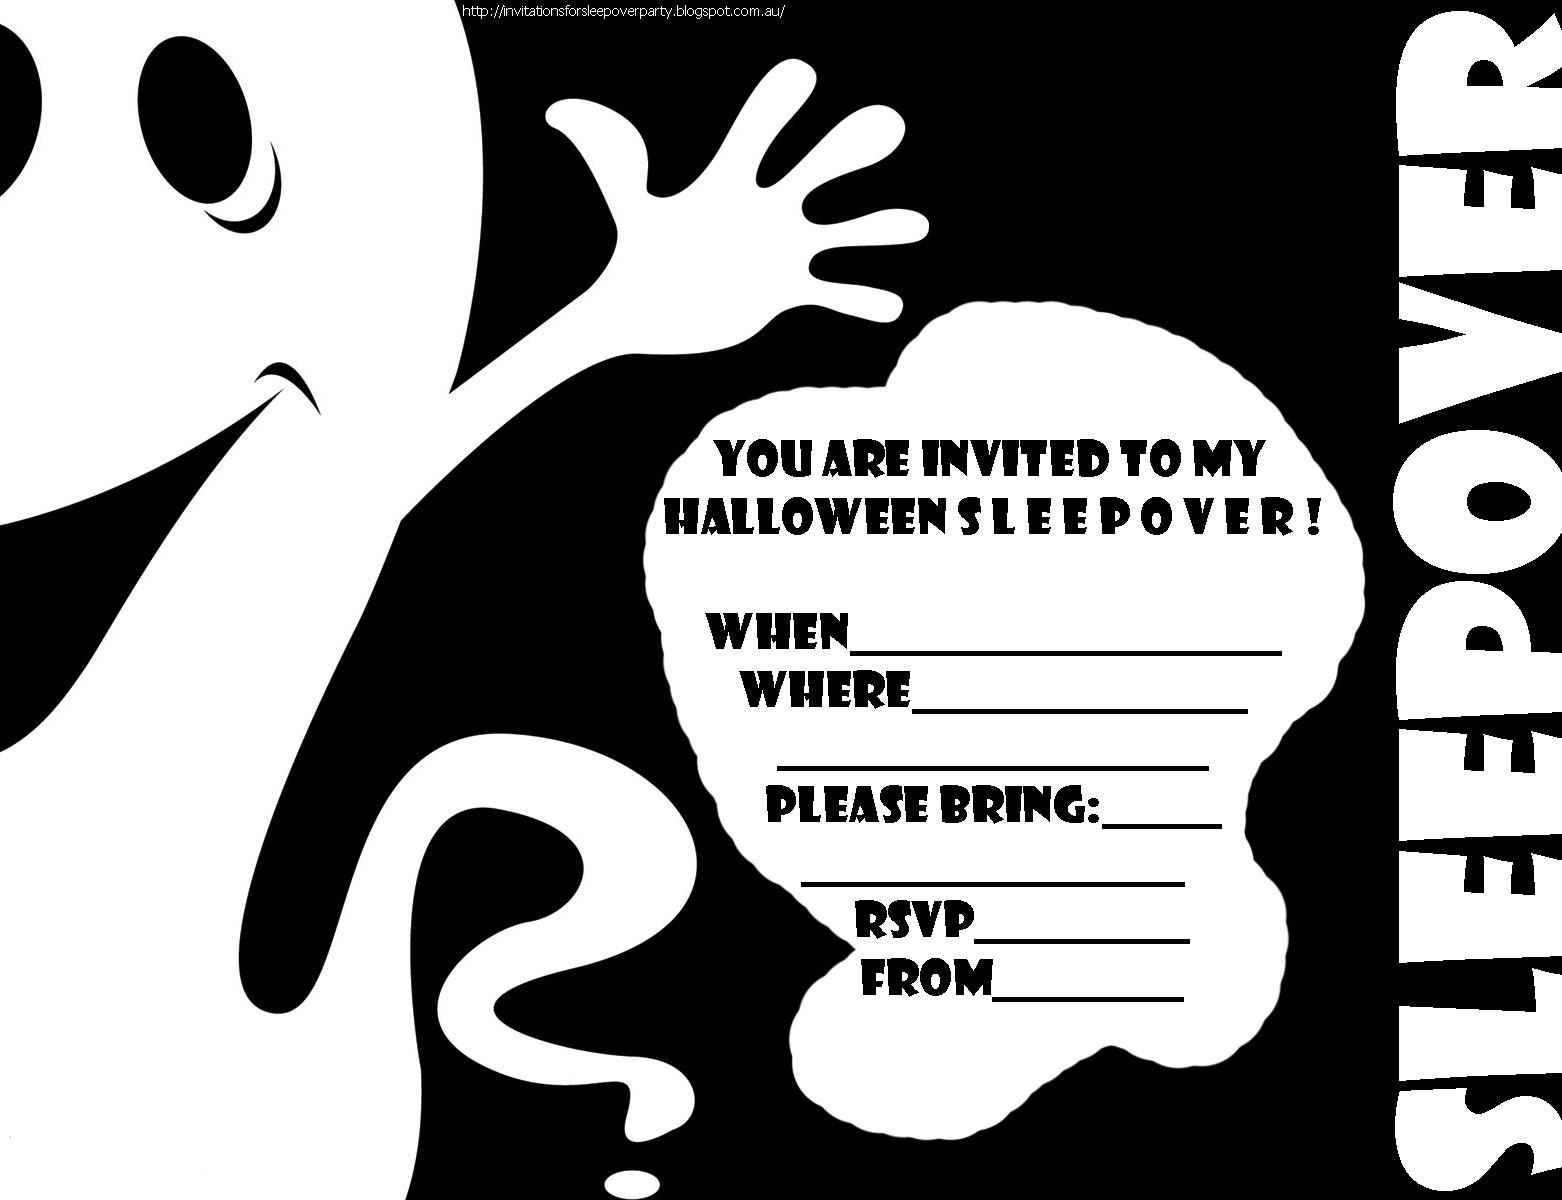 Free Printable Halloween Sleepover Invitations   Halloween Arts - Halloween Invitations Free Printable Black And White